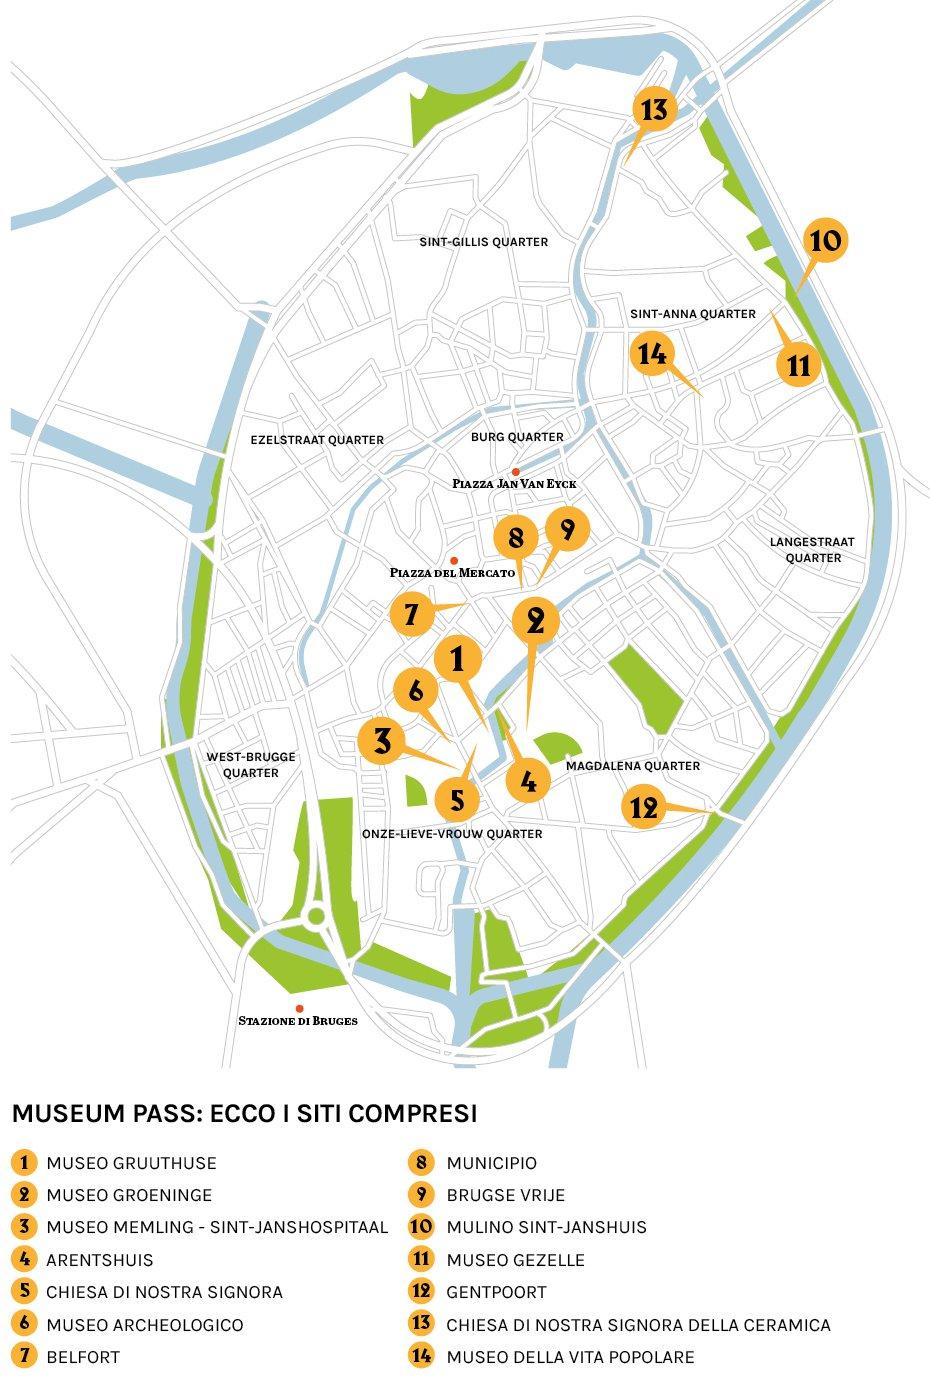 Mappa di Bruges (c) Artribune Magazine